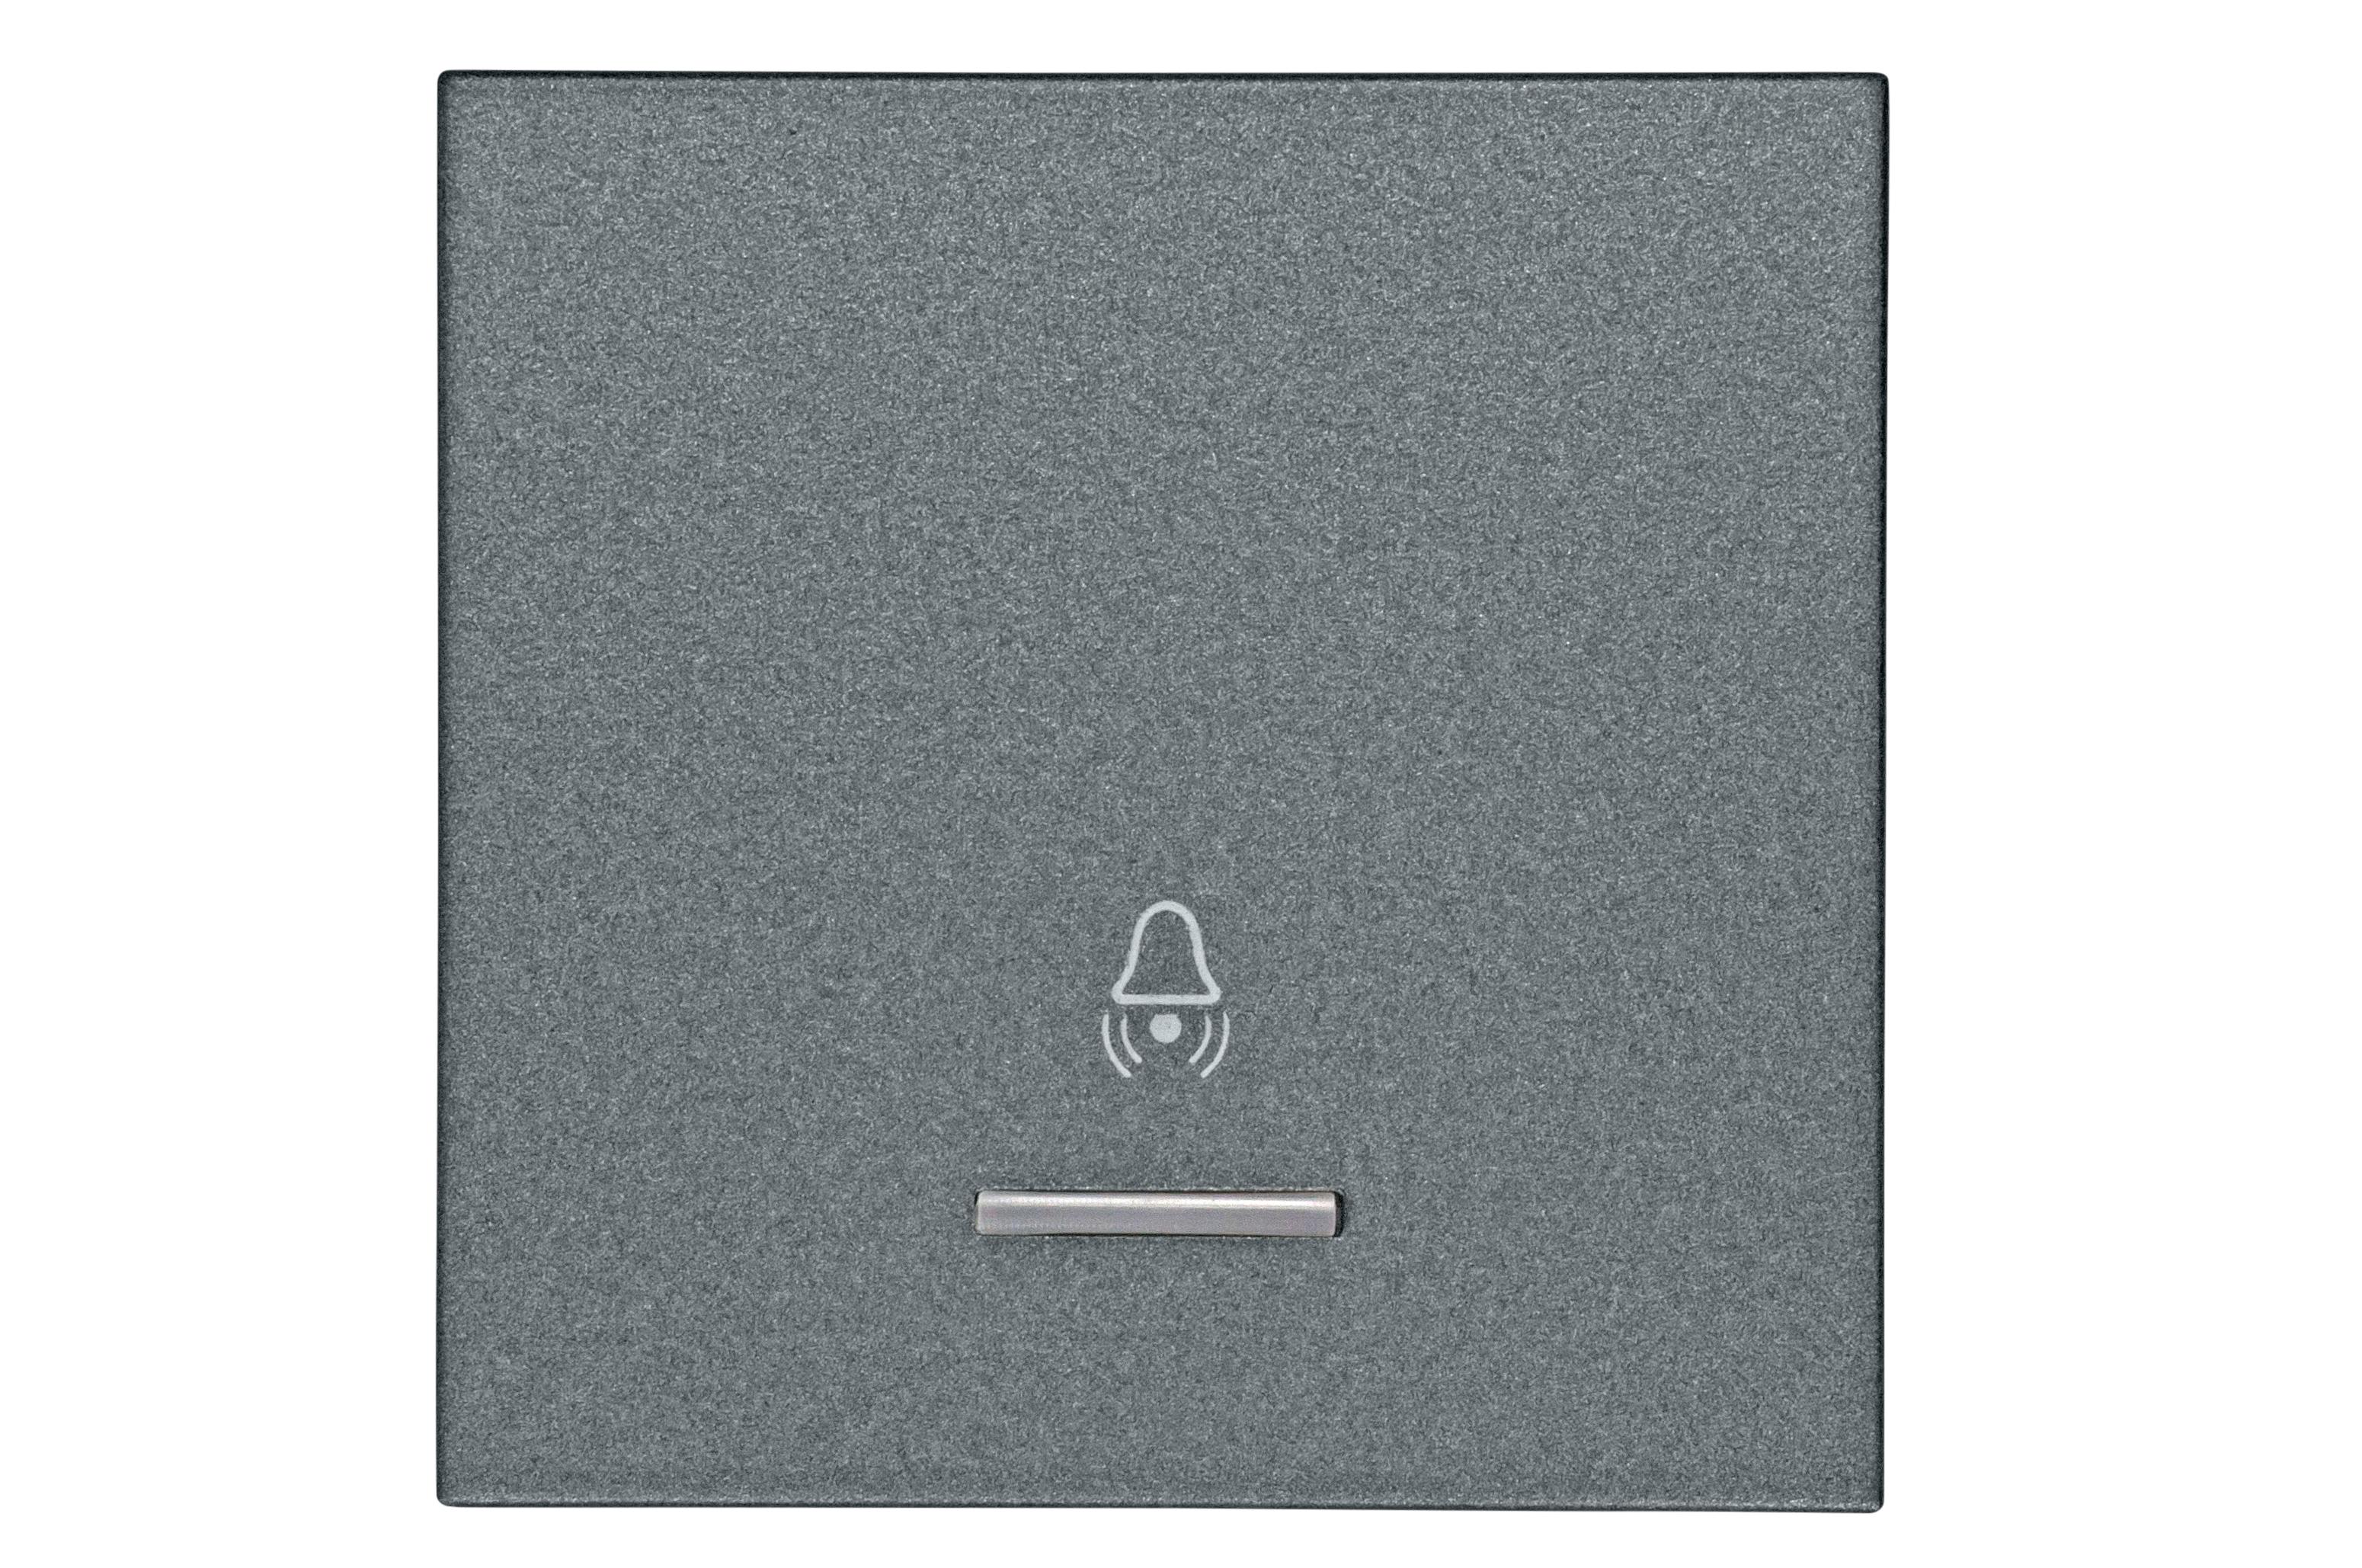 1 Stk Wippe mit transparenter Linse, Symbol Glocke, anthrazit EV112010--